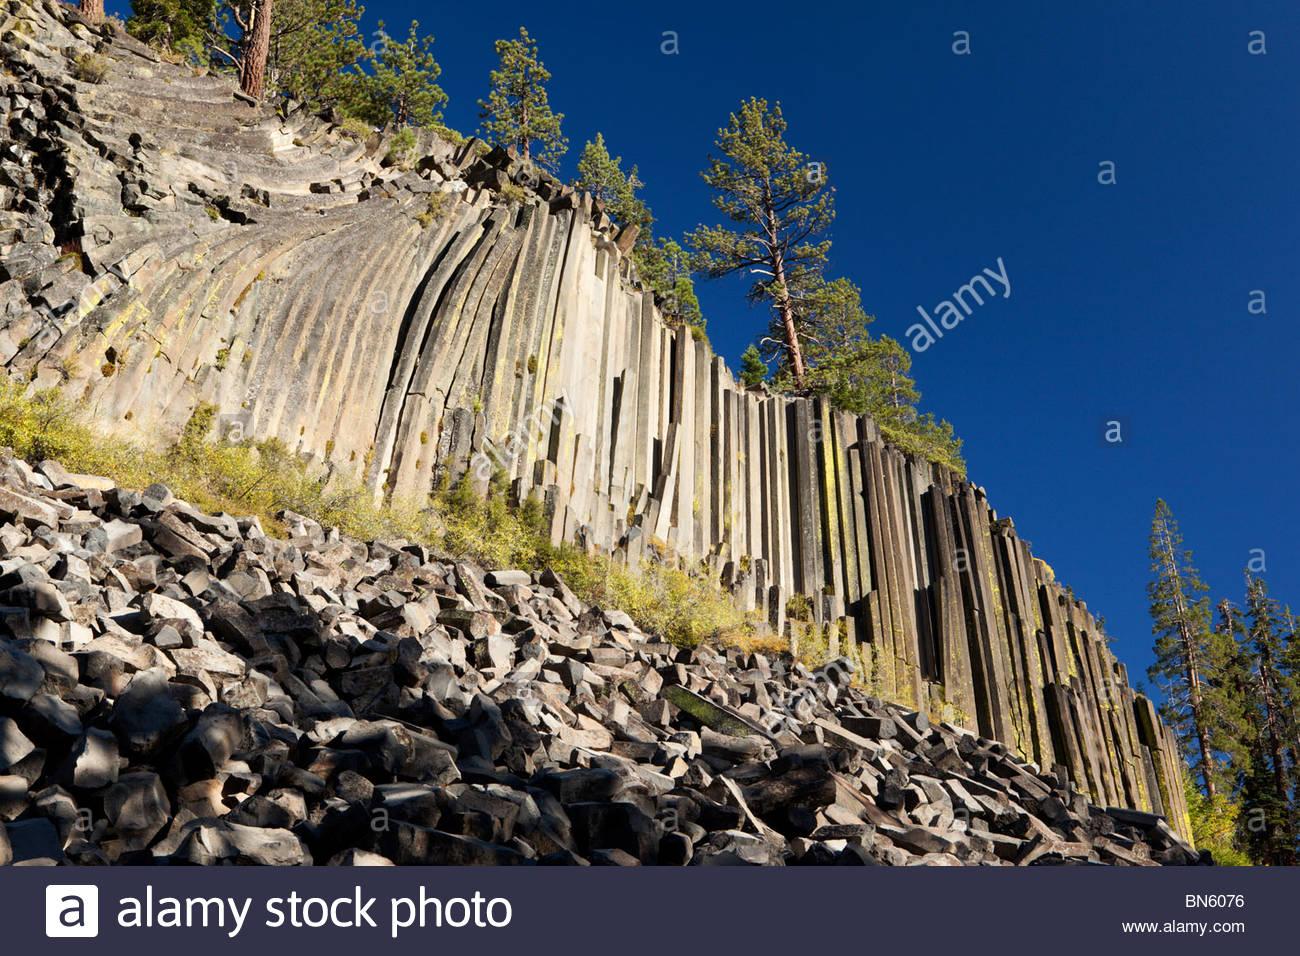 Devils Postpile National Monument, California - Stock Image